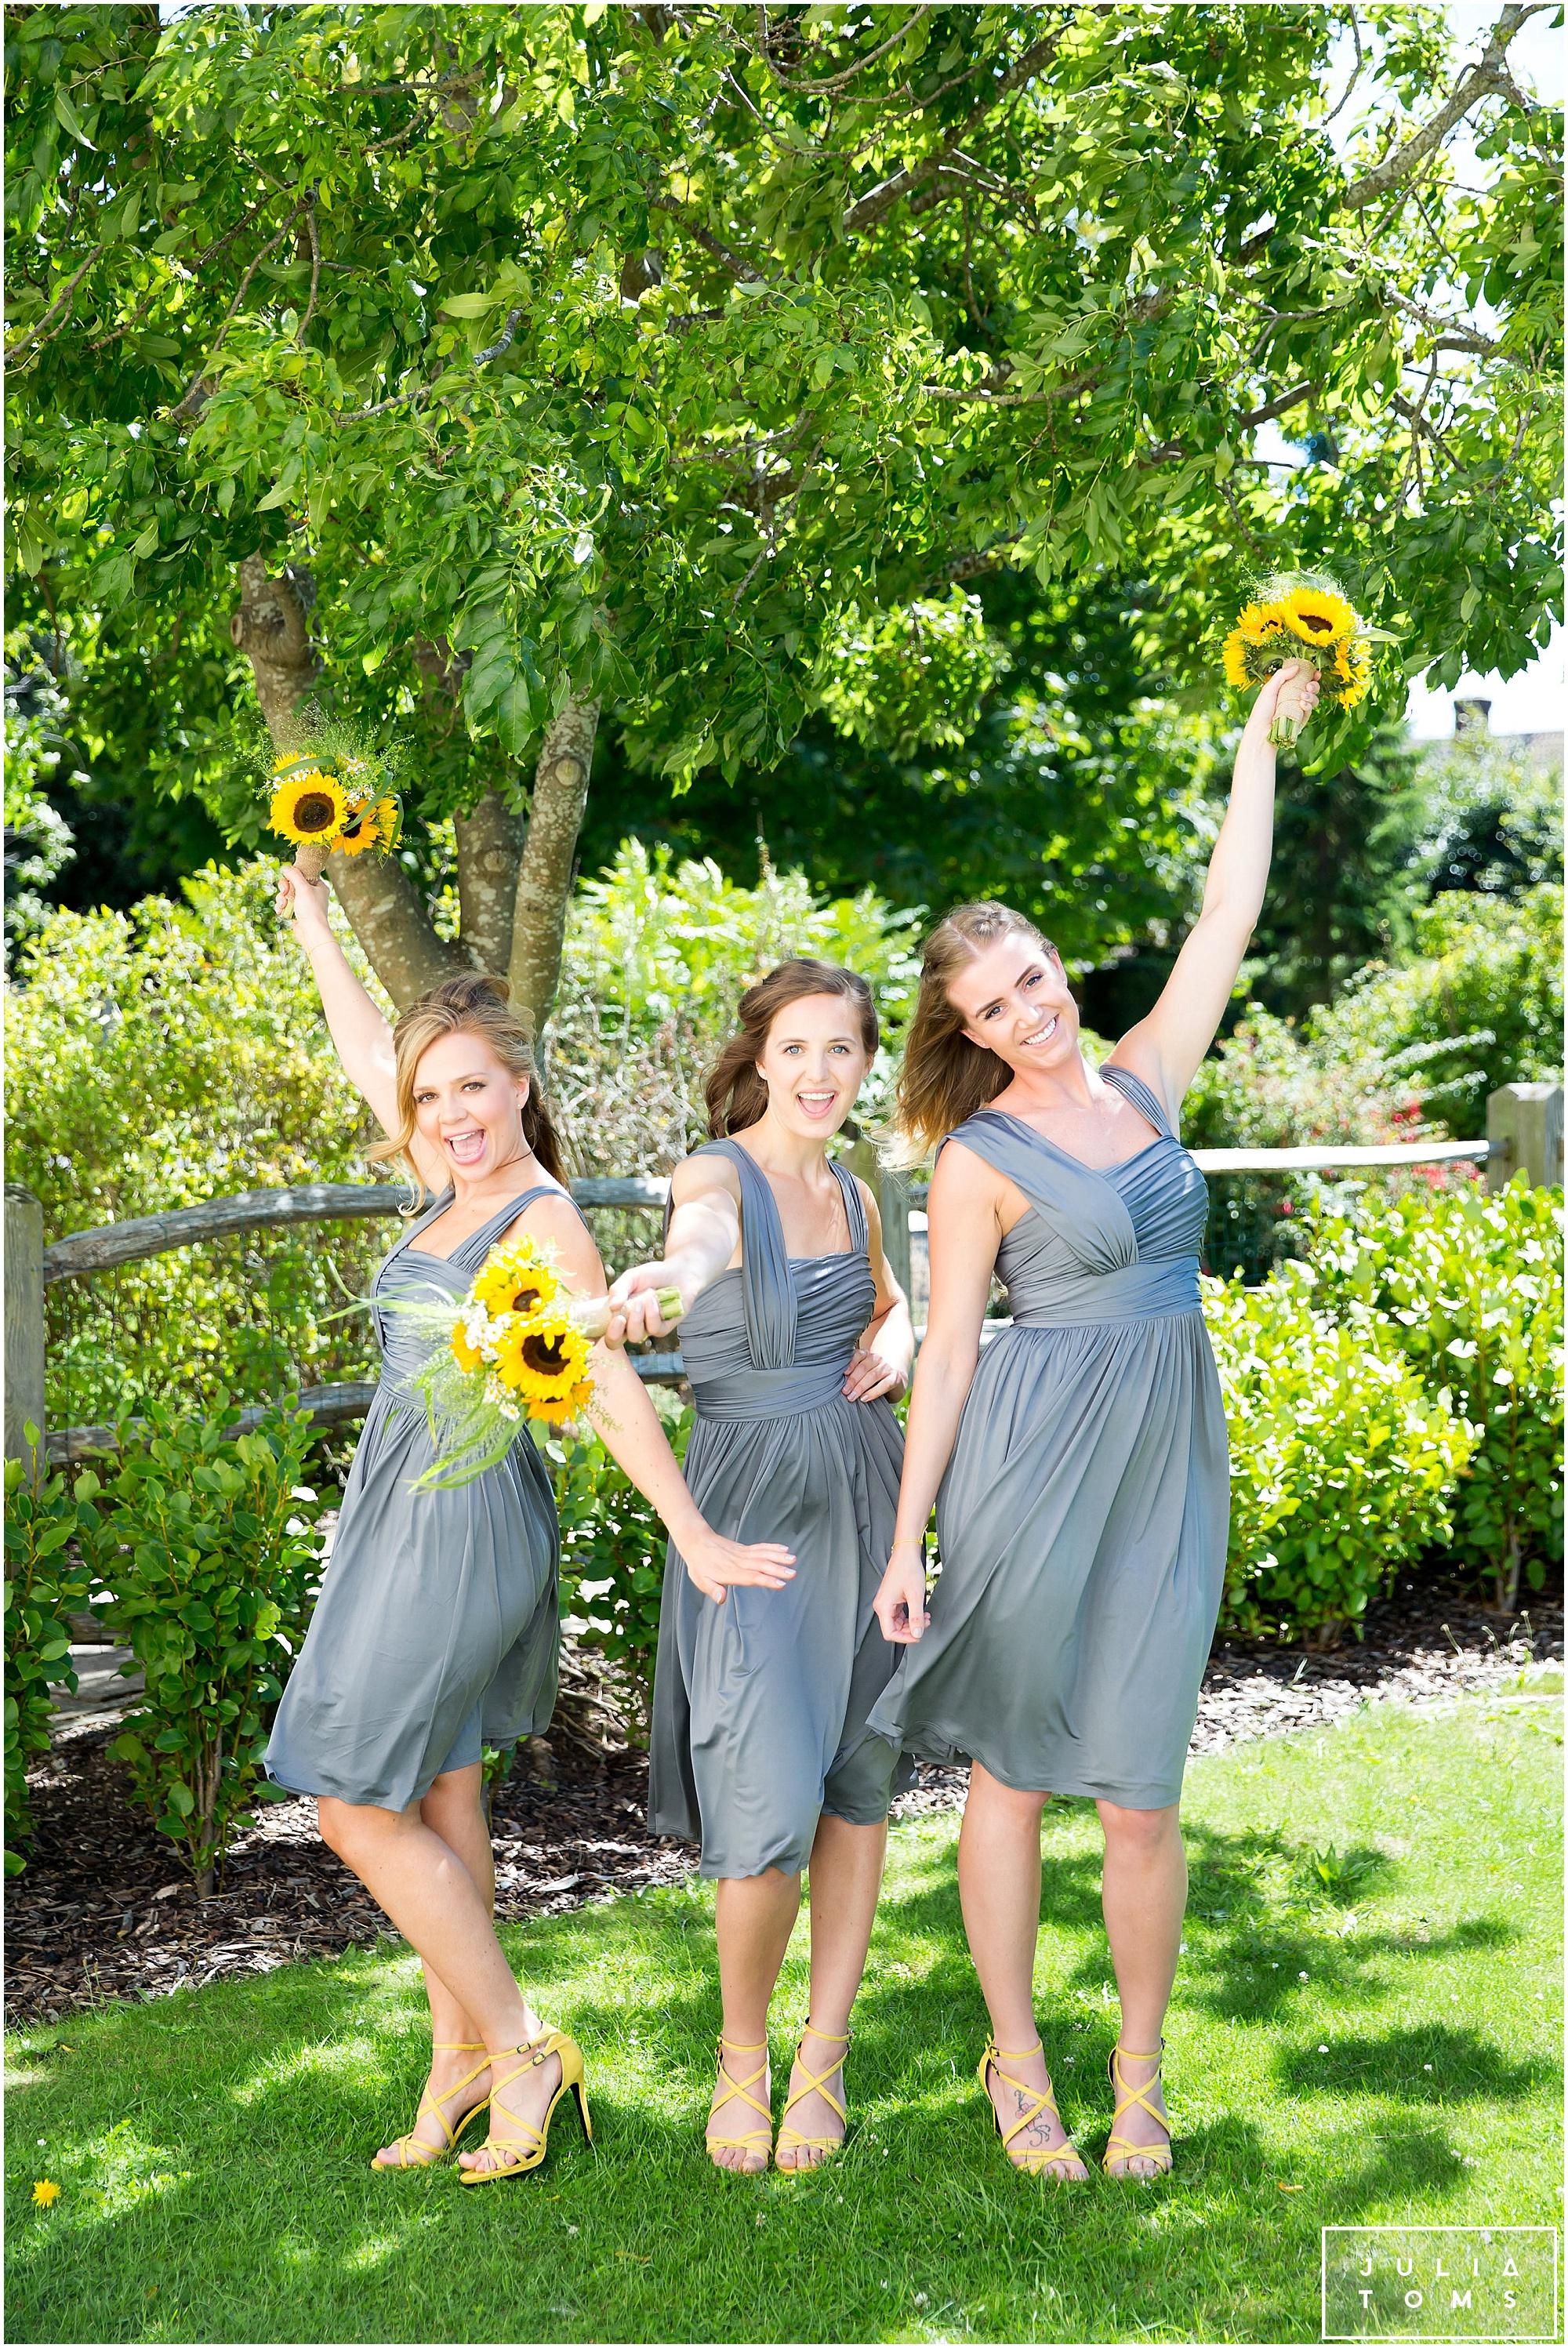 julia_toms_chichester_wedding_photographer_worthing_011.jpg